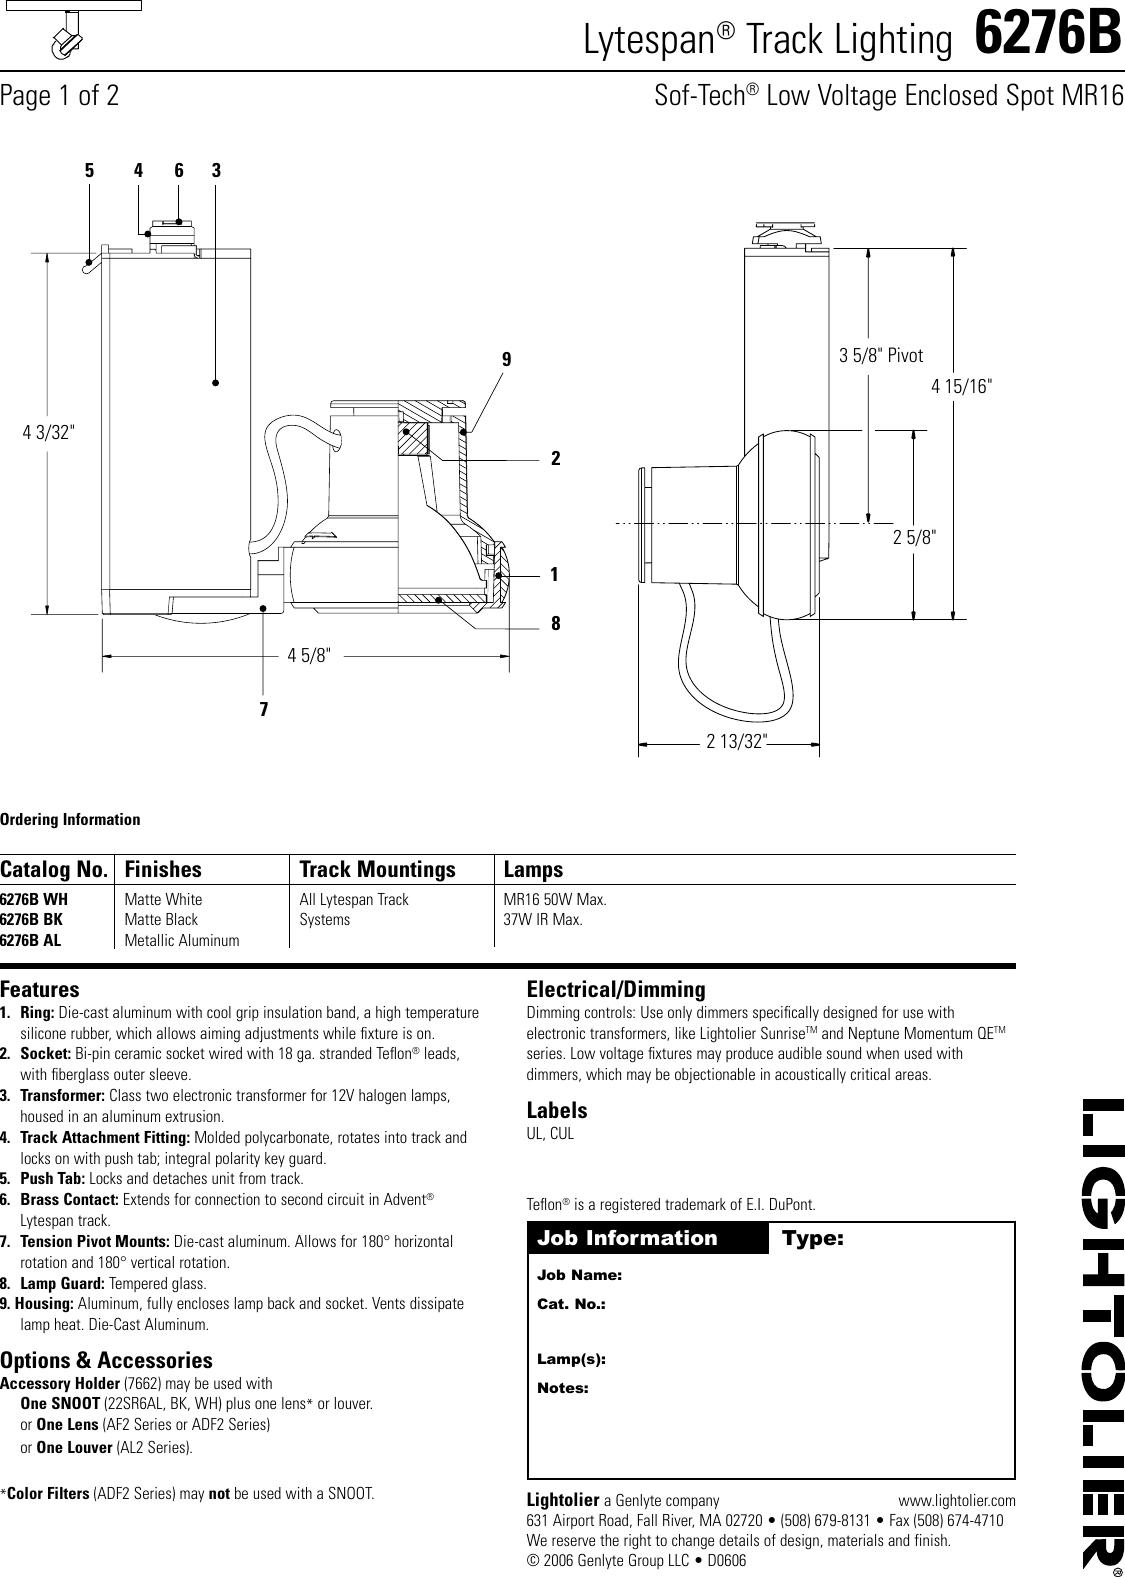 lightolier lytespan track lighting 6276b users manual